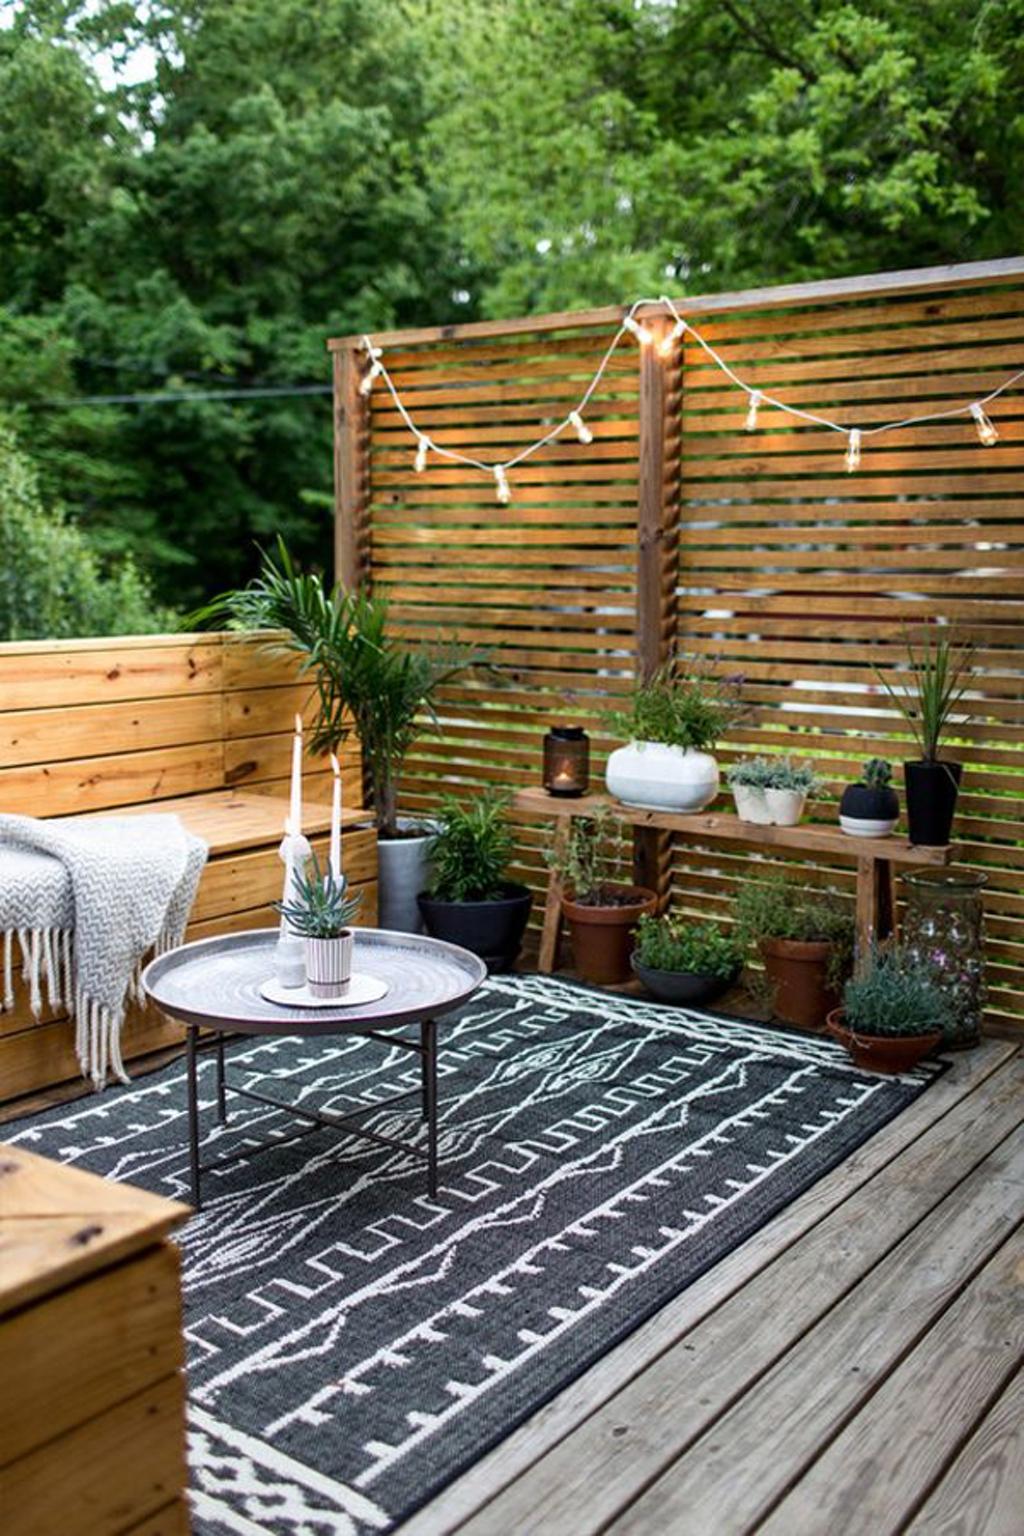 19.SIMPHOME.COM An outdoor romantic backyard deck with lights